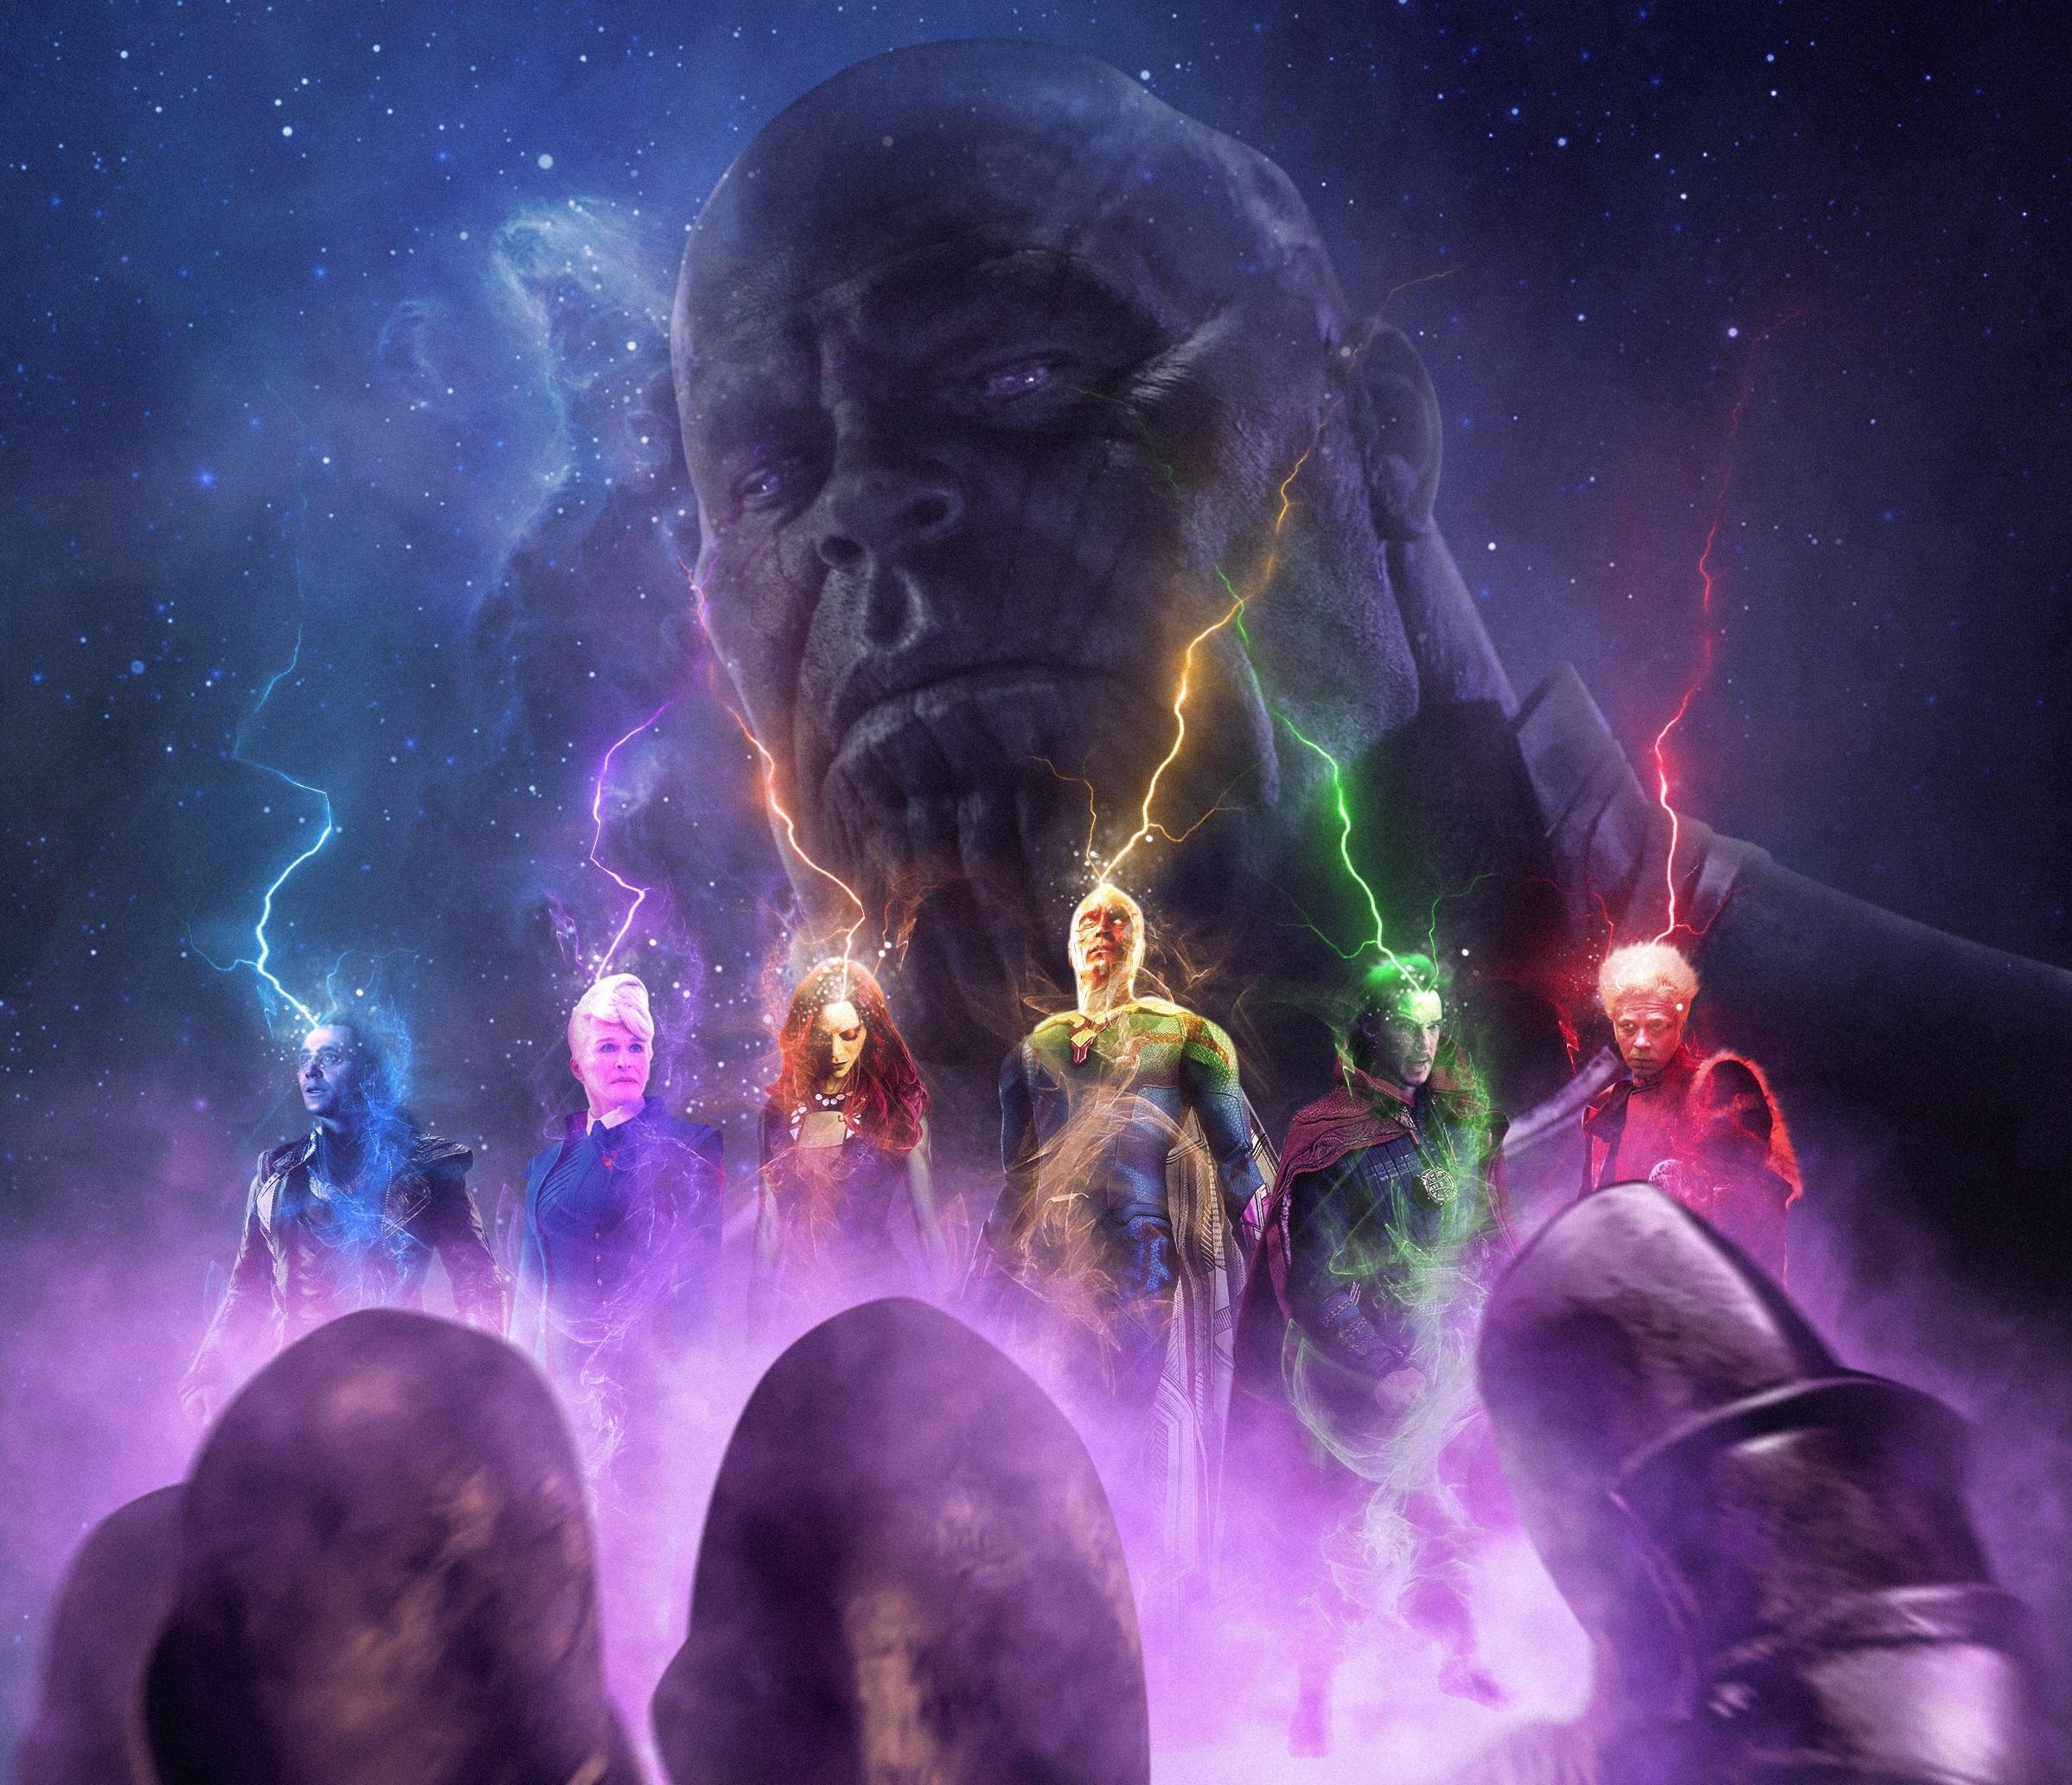 Avengers Infinity War Doctor Strange Gamora Loki Thanos Vision Marvel Comics 2396x2064